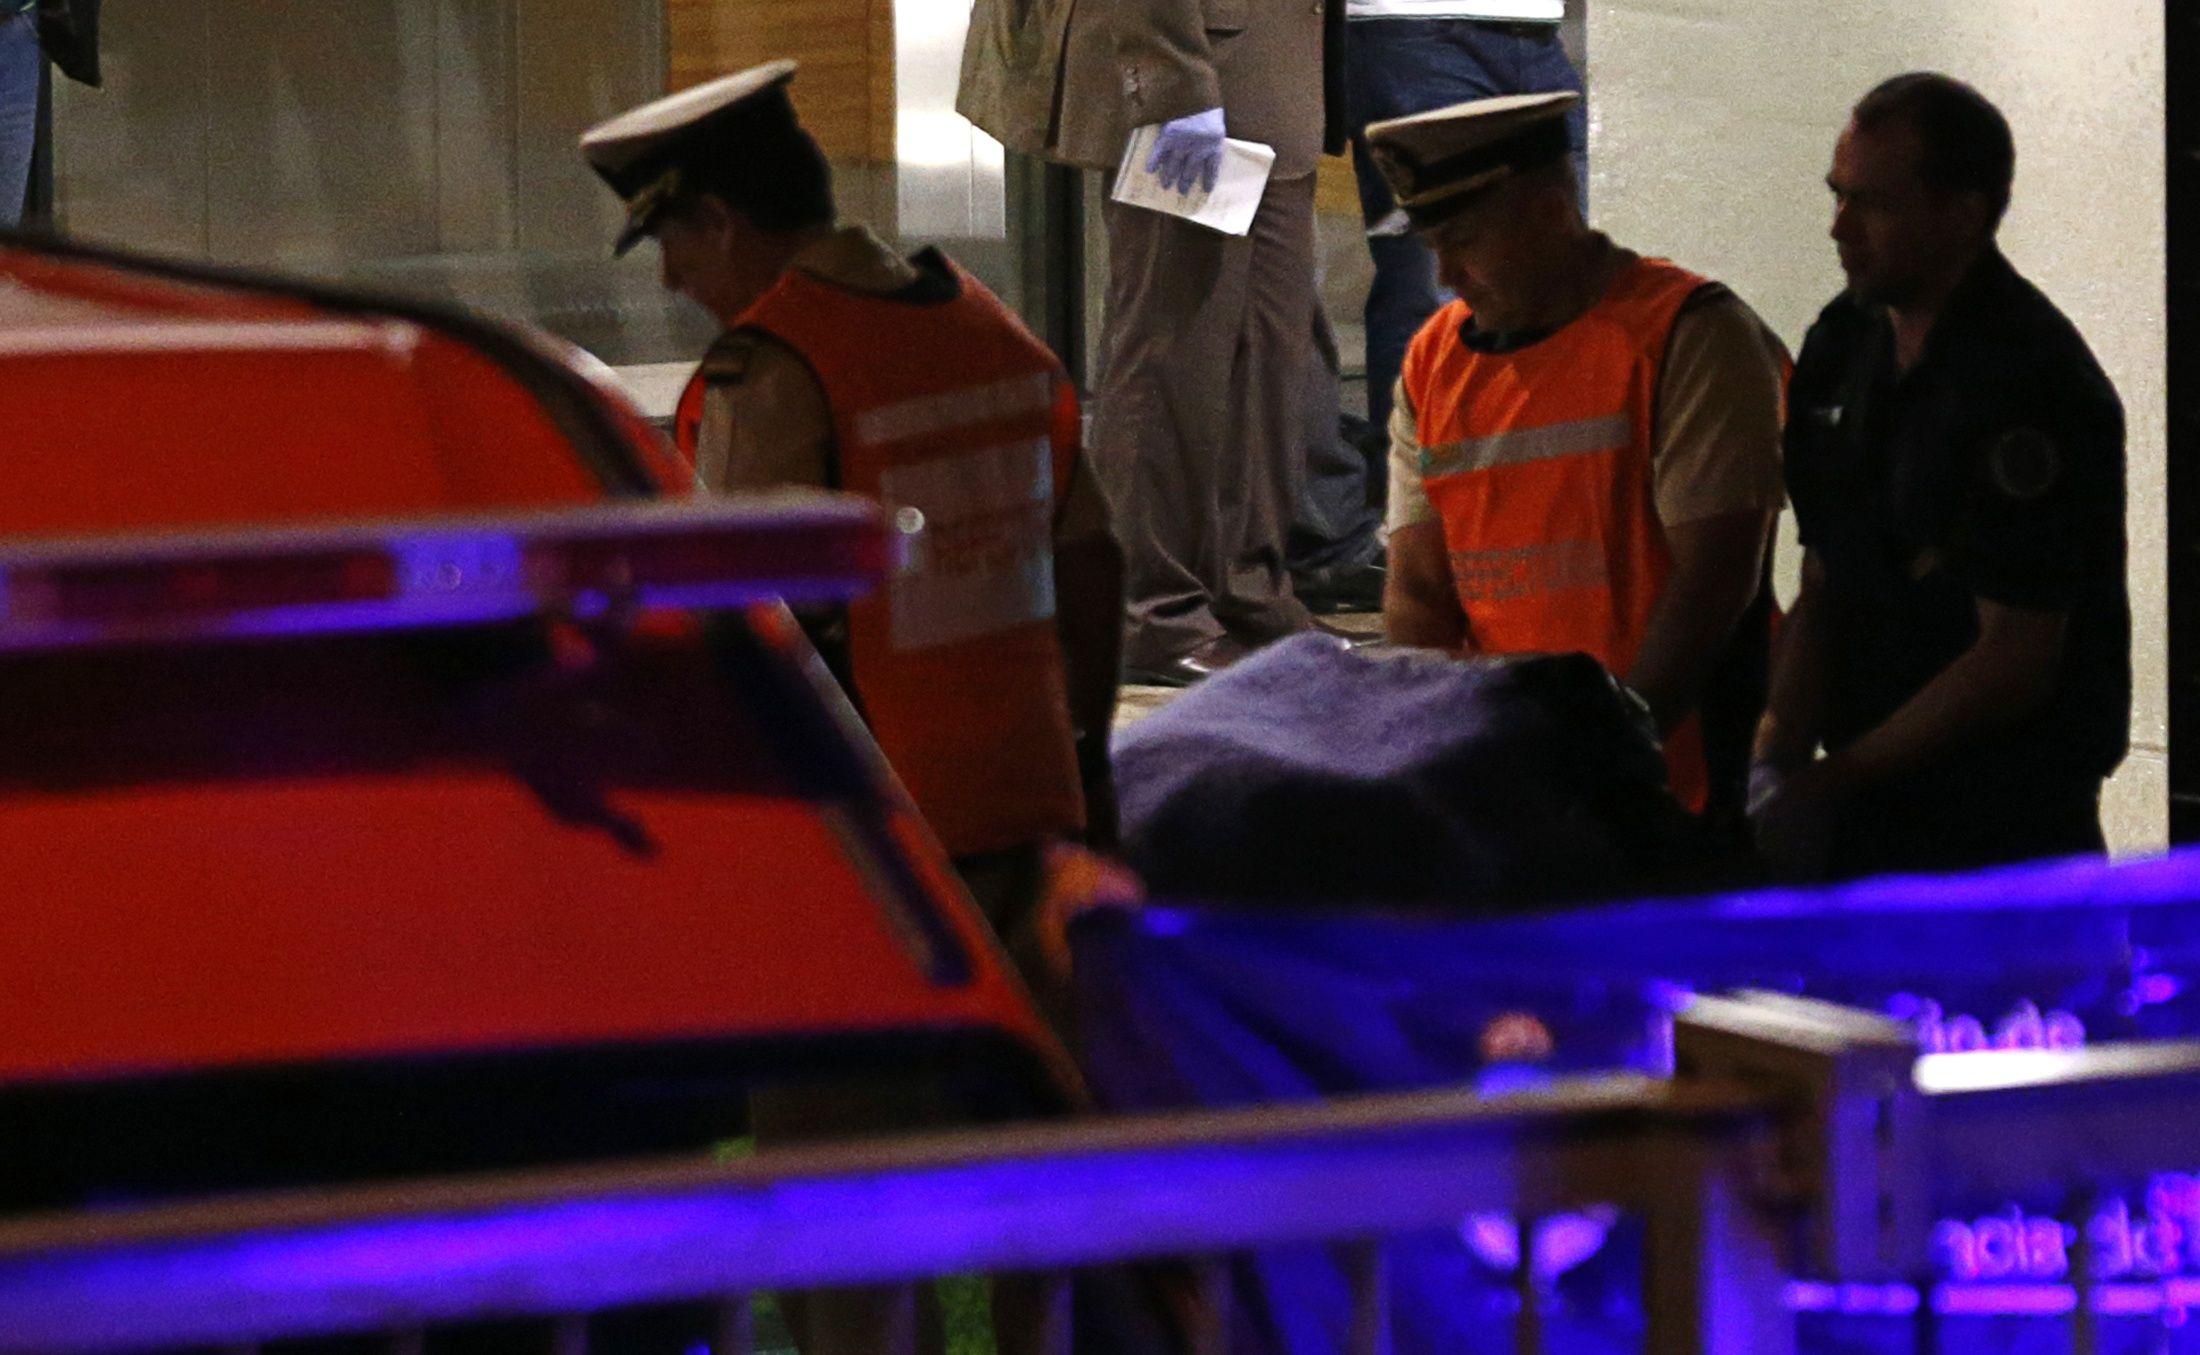 Ayer a la madrugada. Efectivos de Prefectura Naval retiran el cadáver del fiscal de la torre Le Parc. (Foto: Reuters)